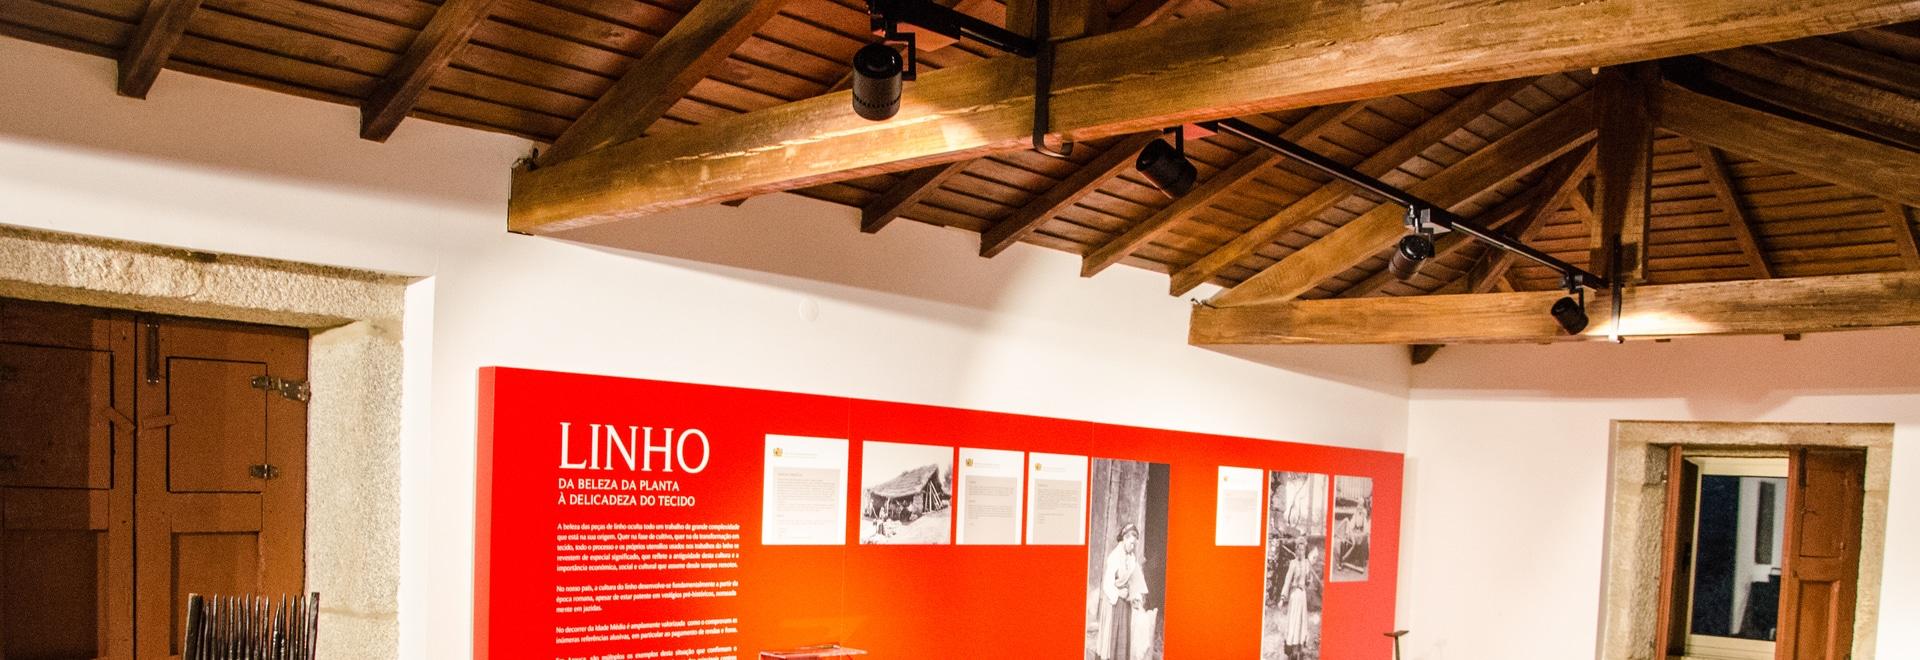 Urrôs Museum